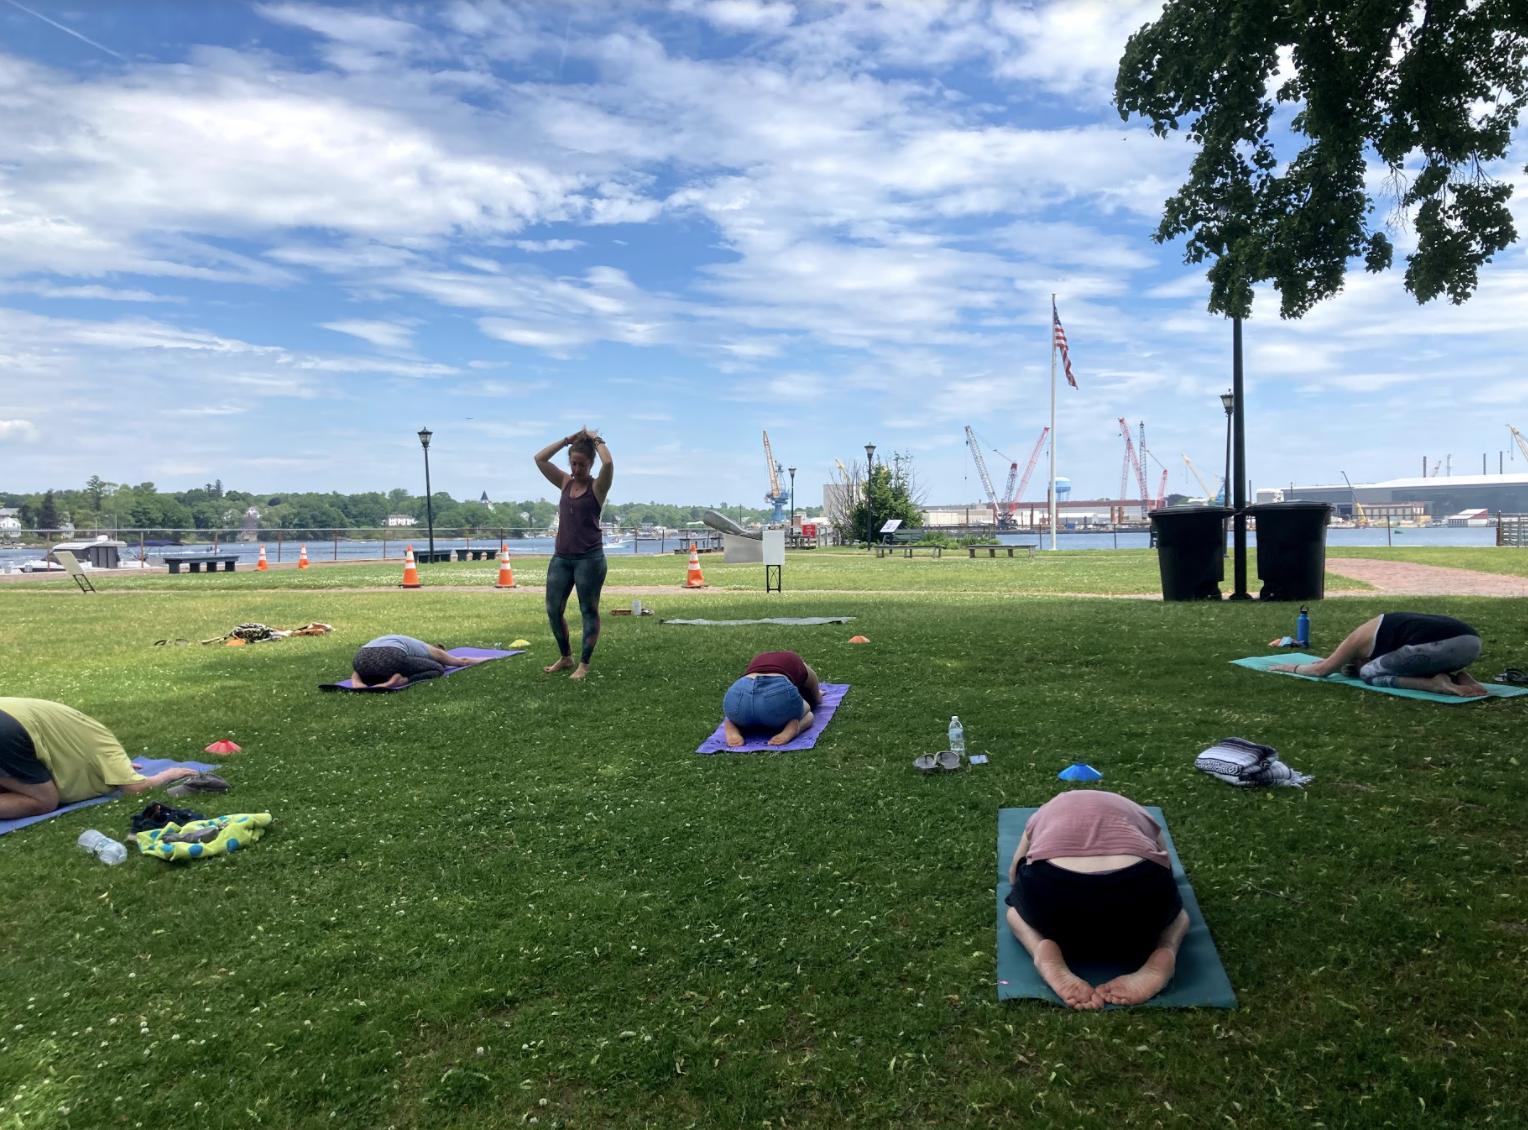 Yoga in the Park at Prescott Park